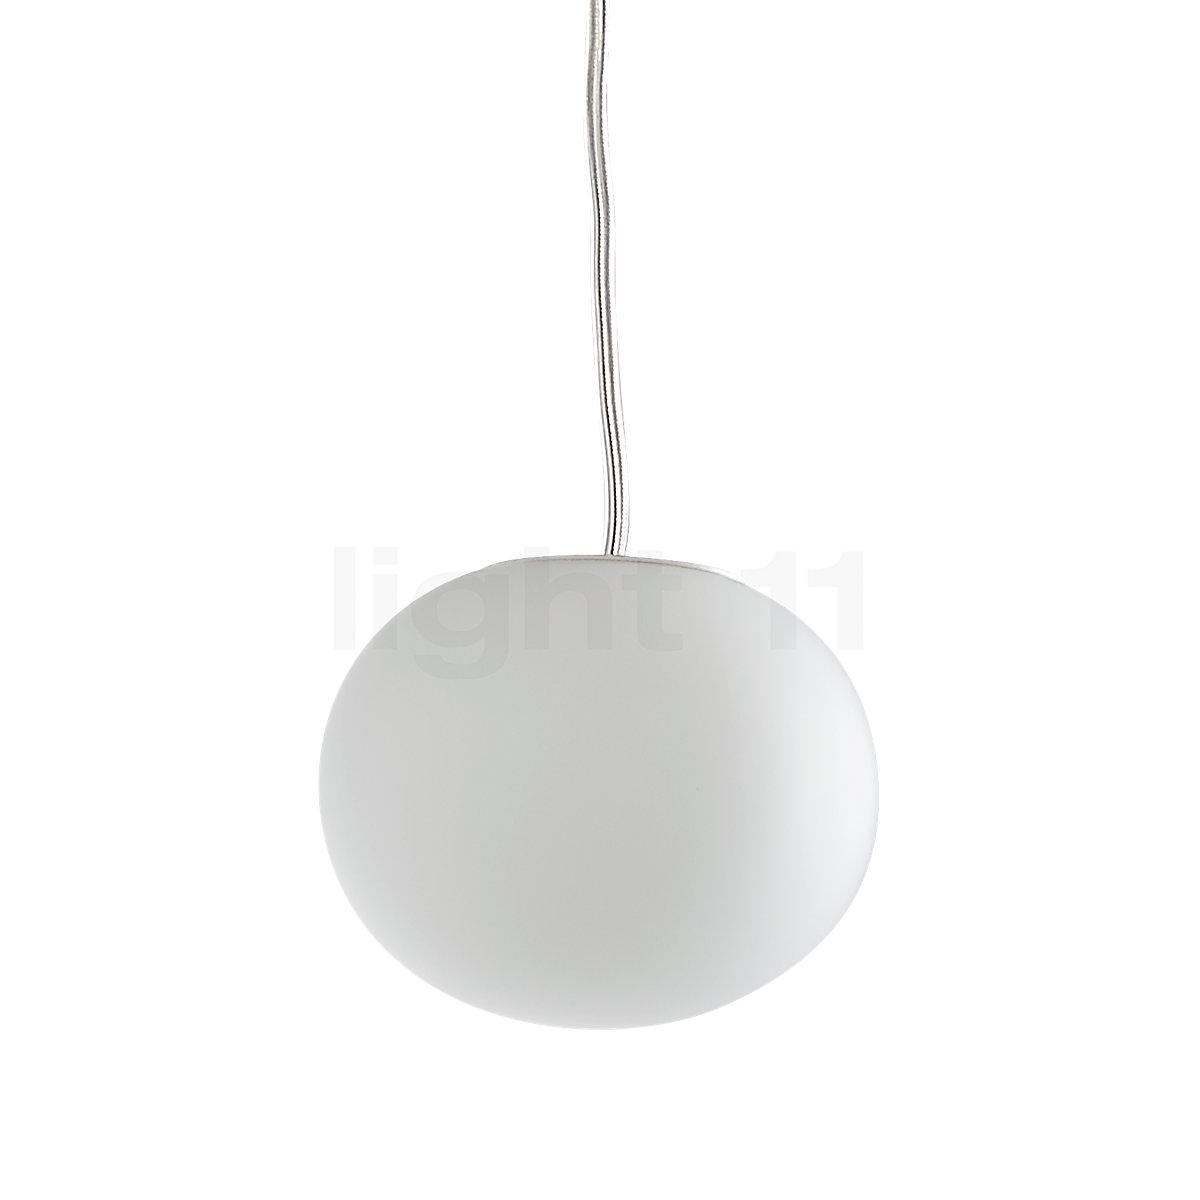 Flos Glo Ball Mini S Light11 It